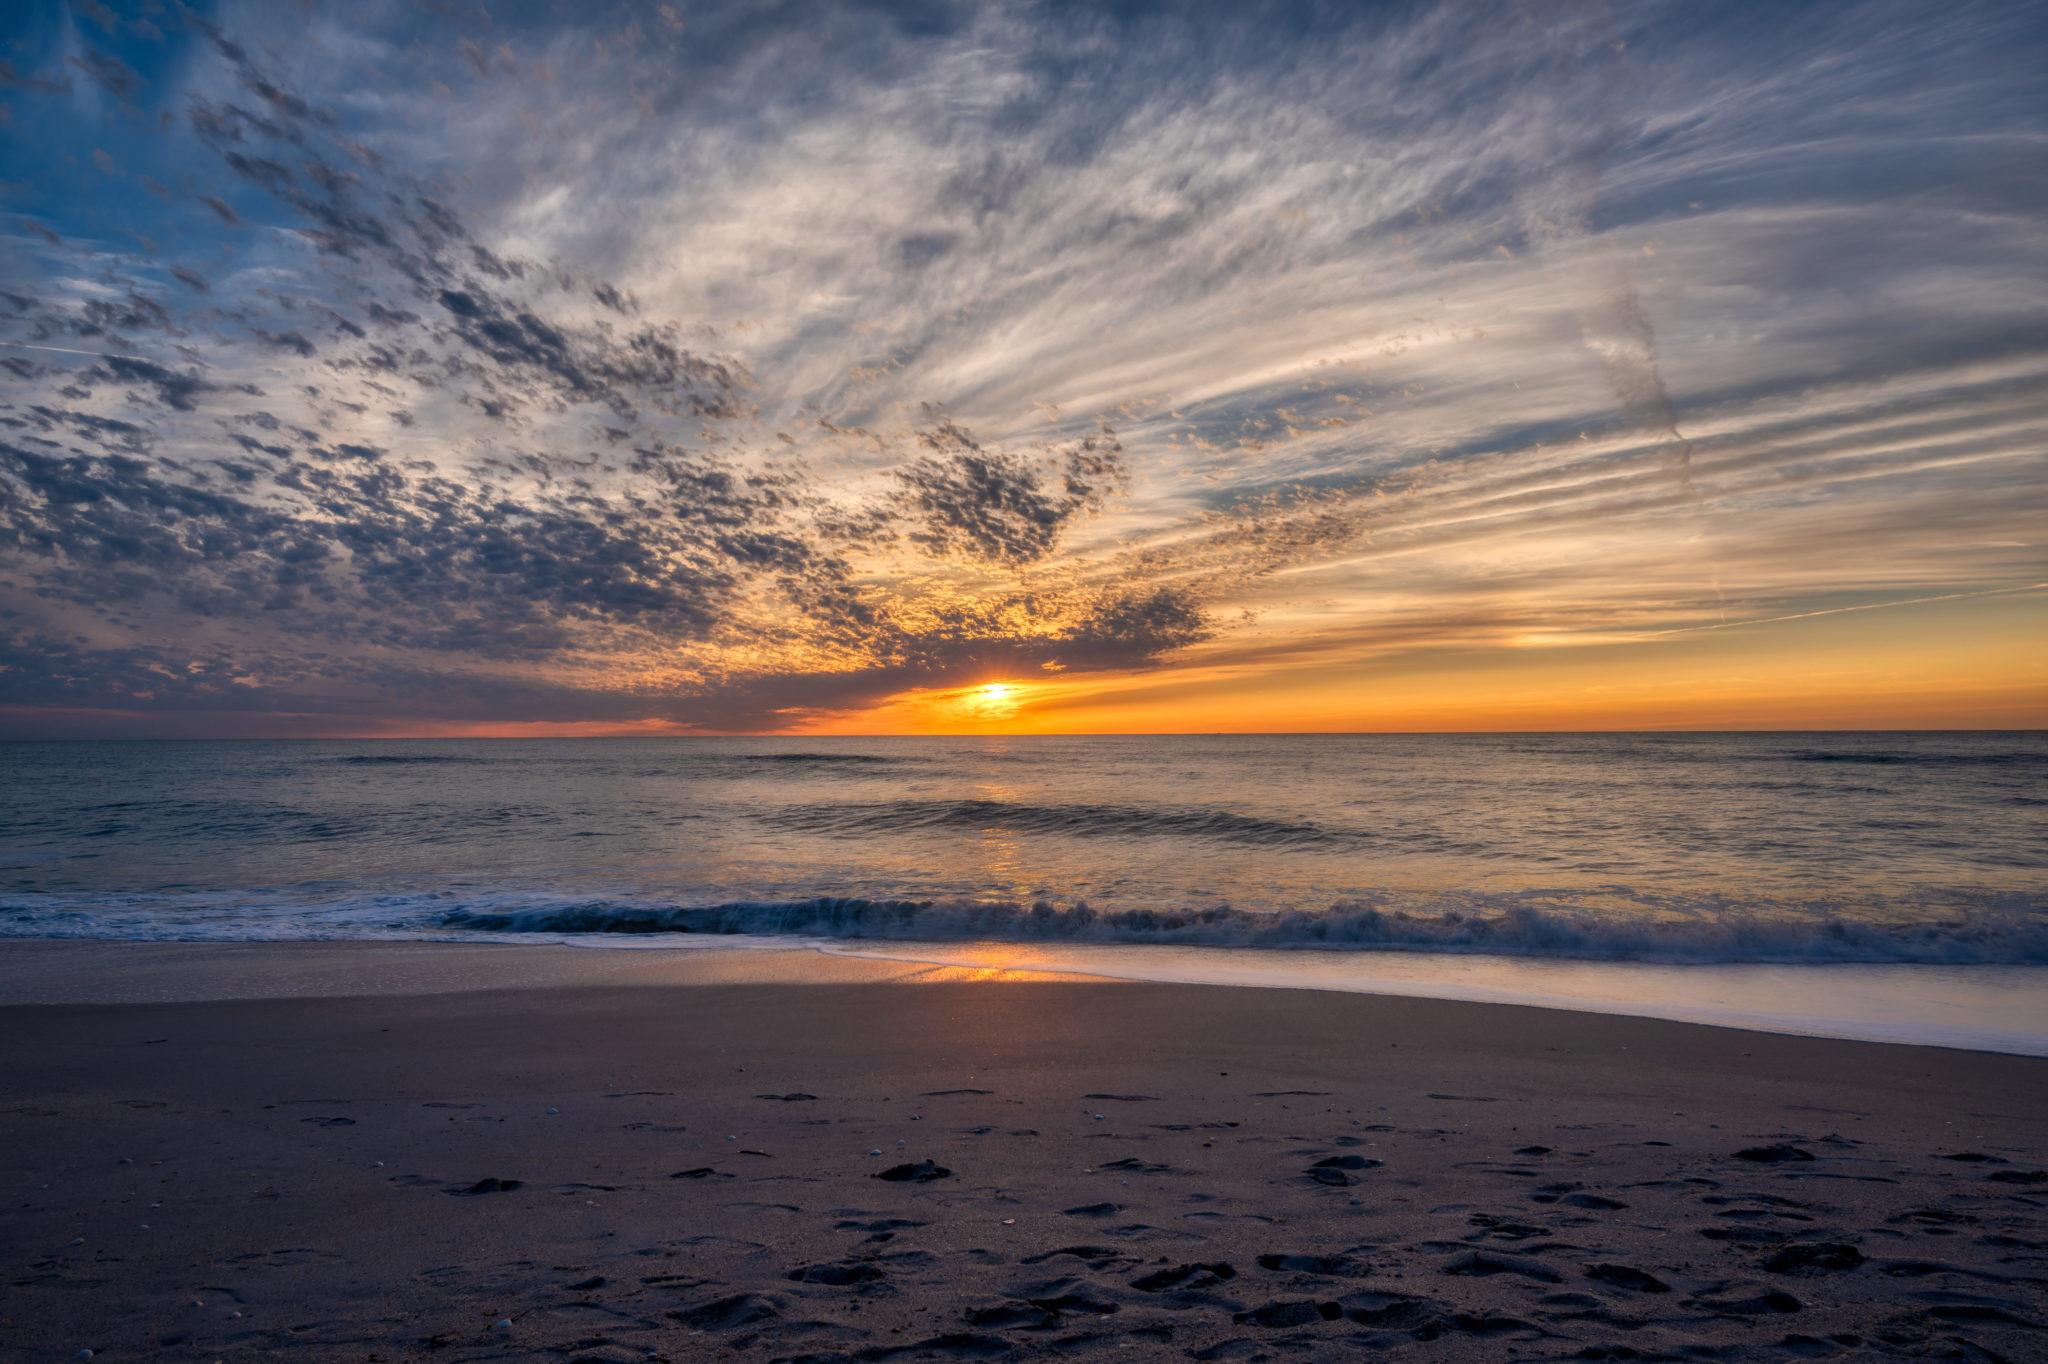 escape-hotel-beach-sunset.jpg